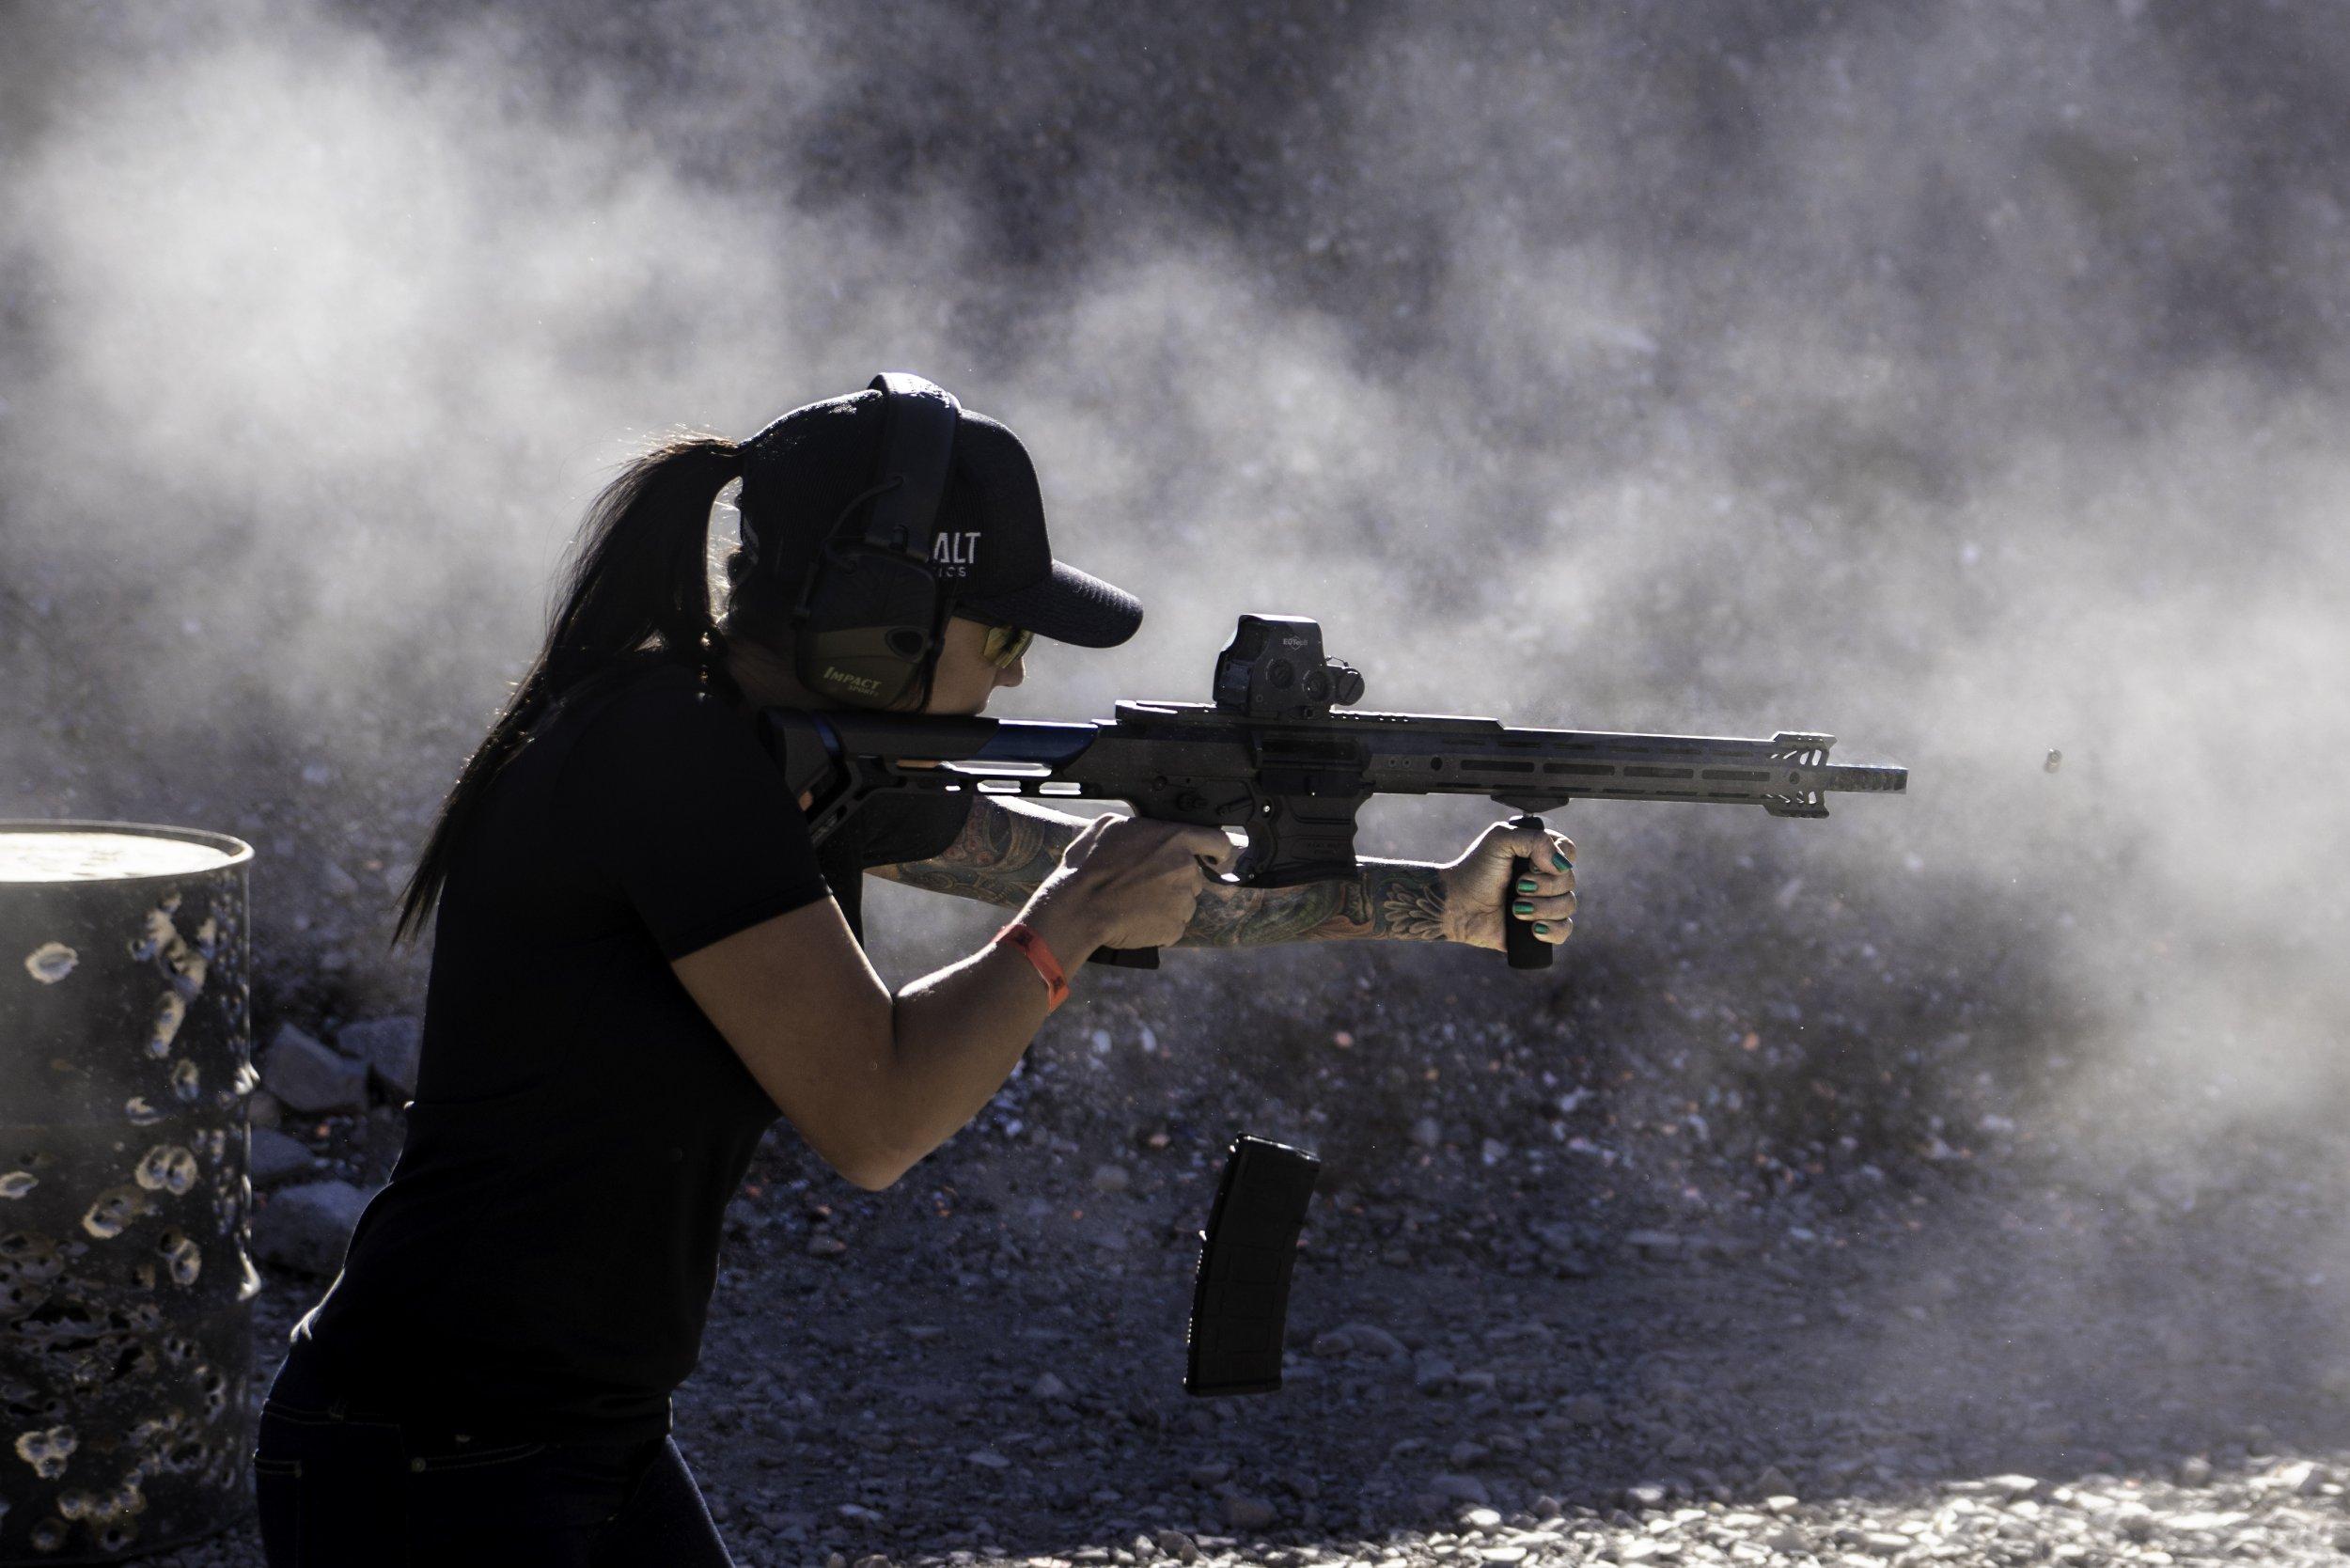 Cobalt Kinetics Evolve 3 Gun Competitiontactical Ar 15 Rifle